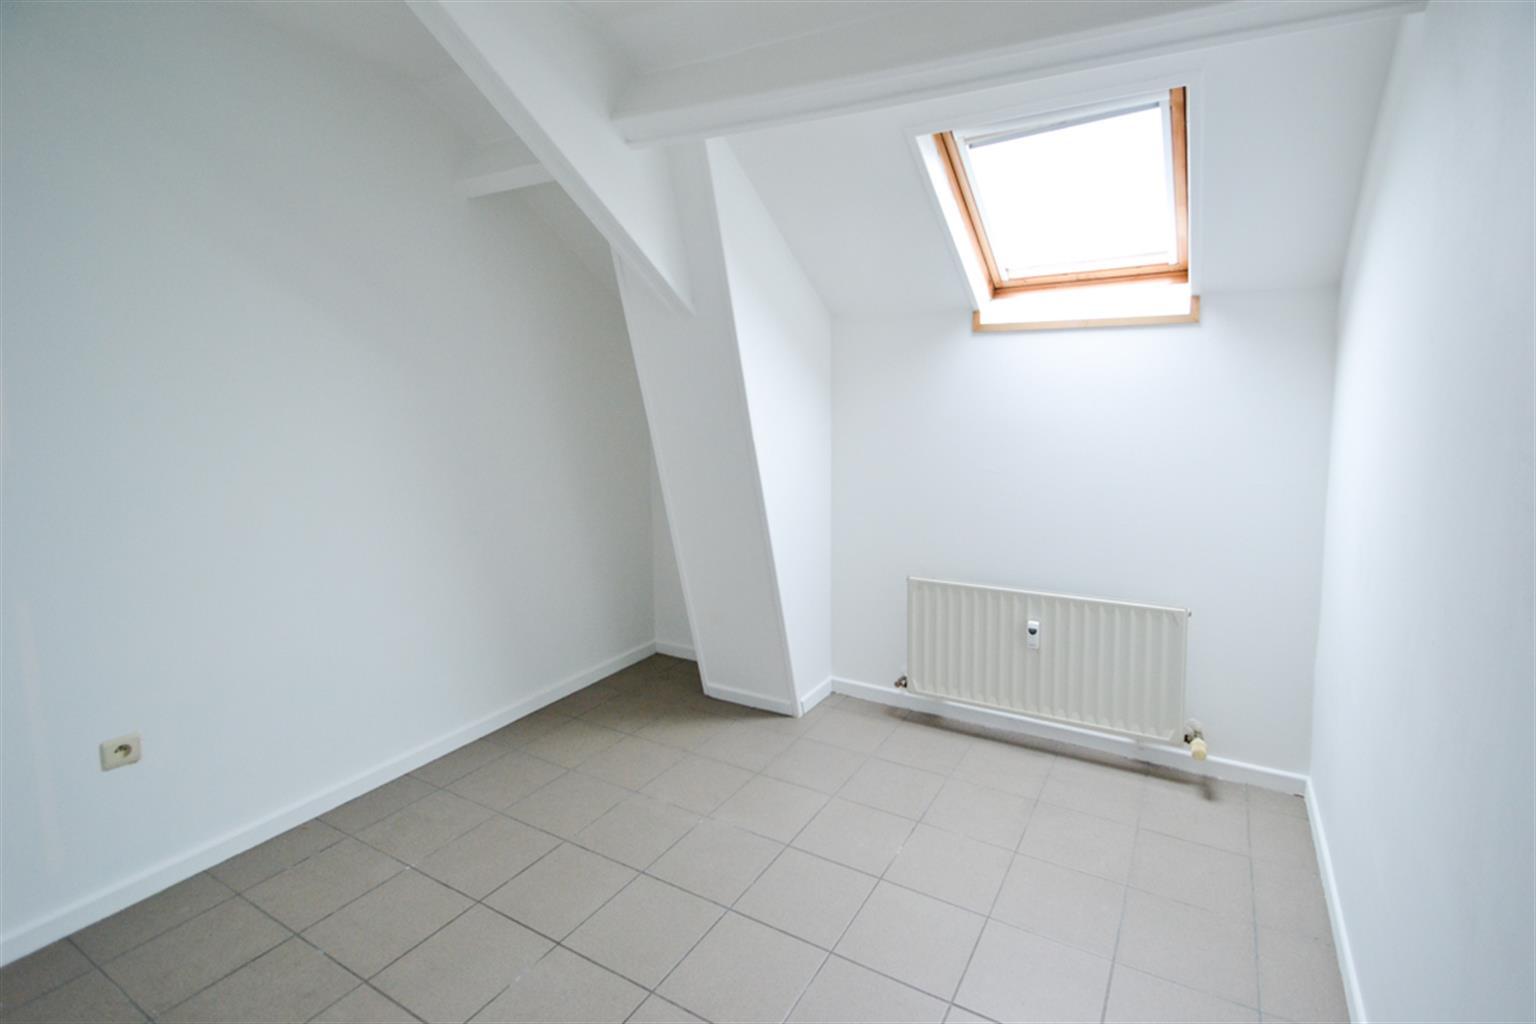 Appartement - Leval-Trahegnies - #3703788-4